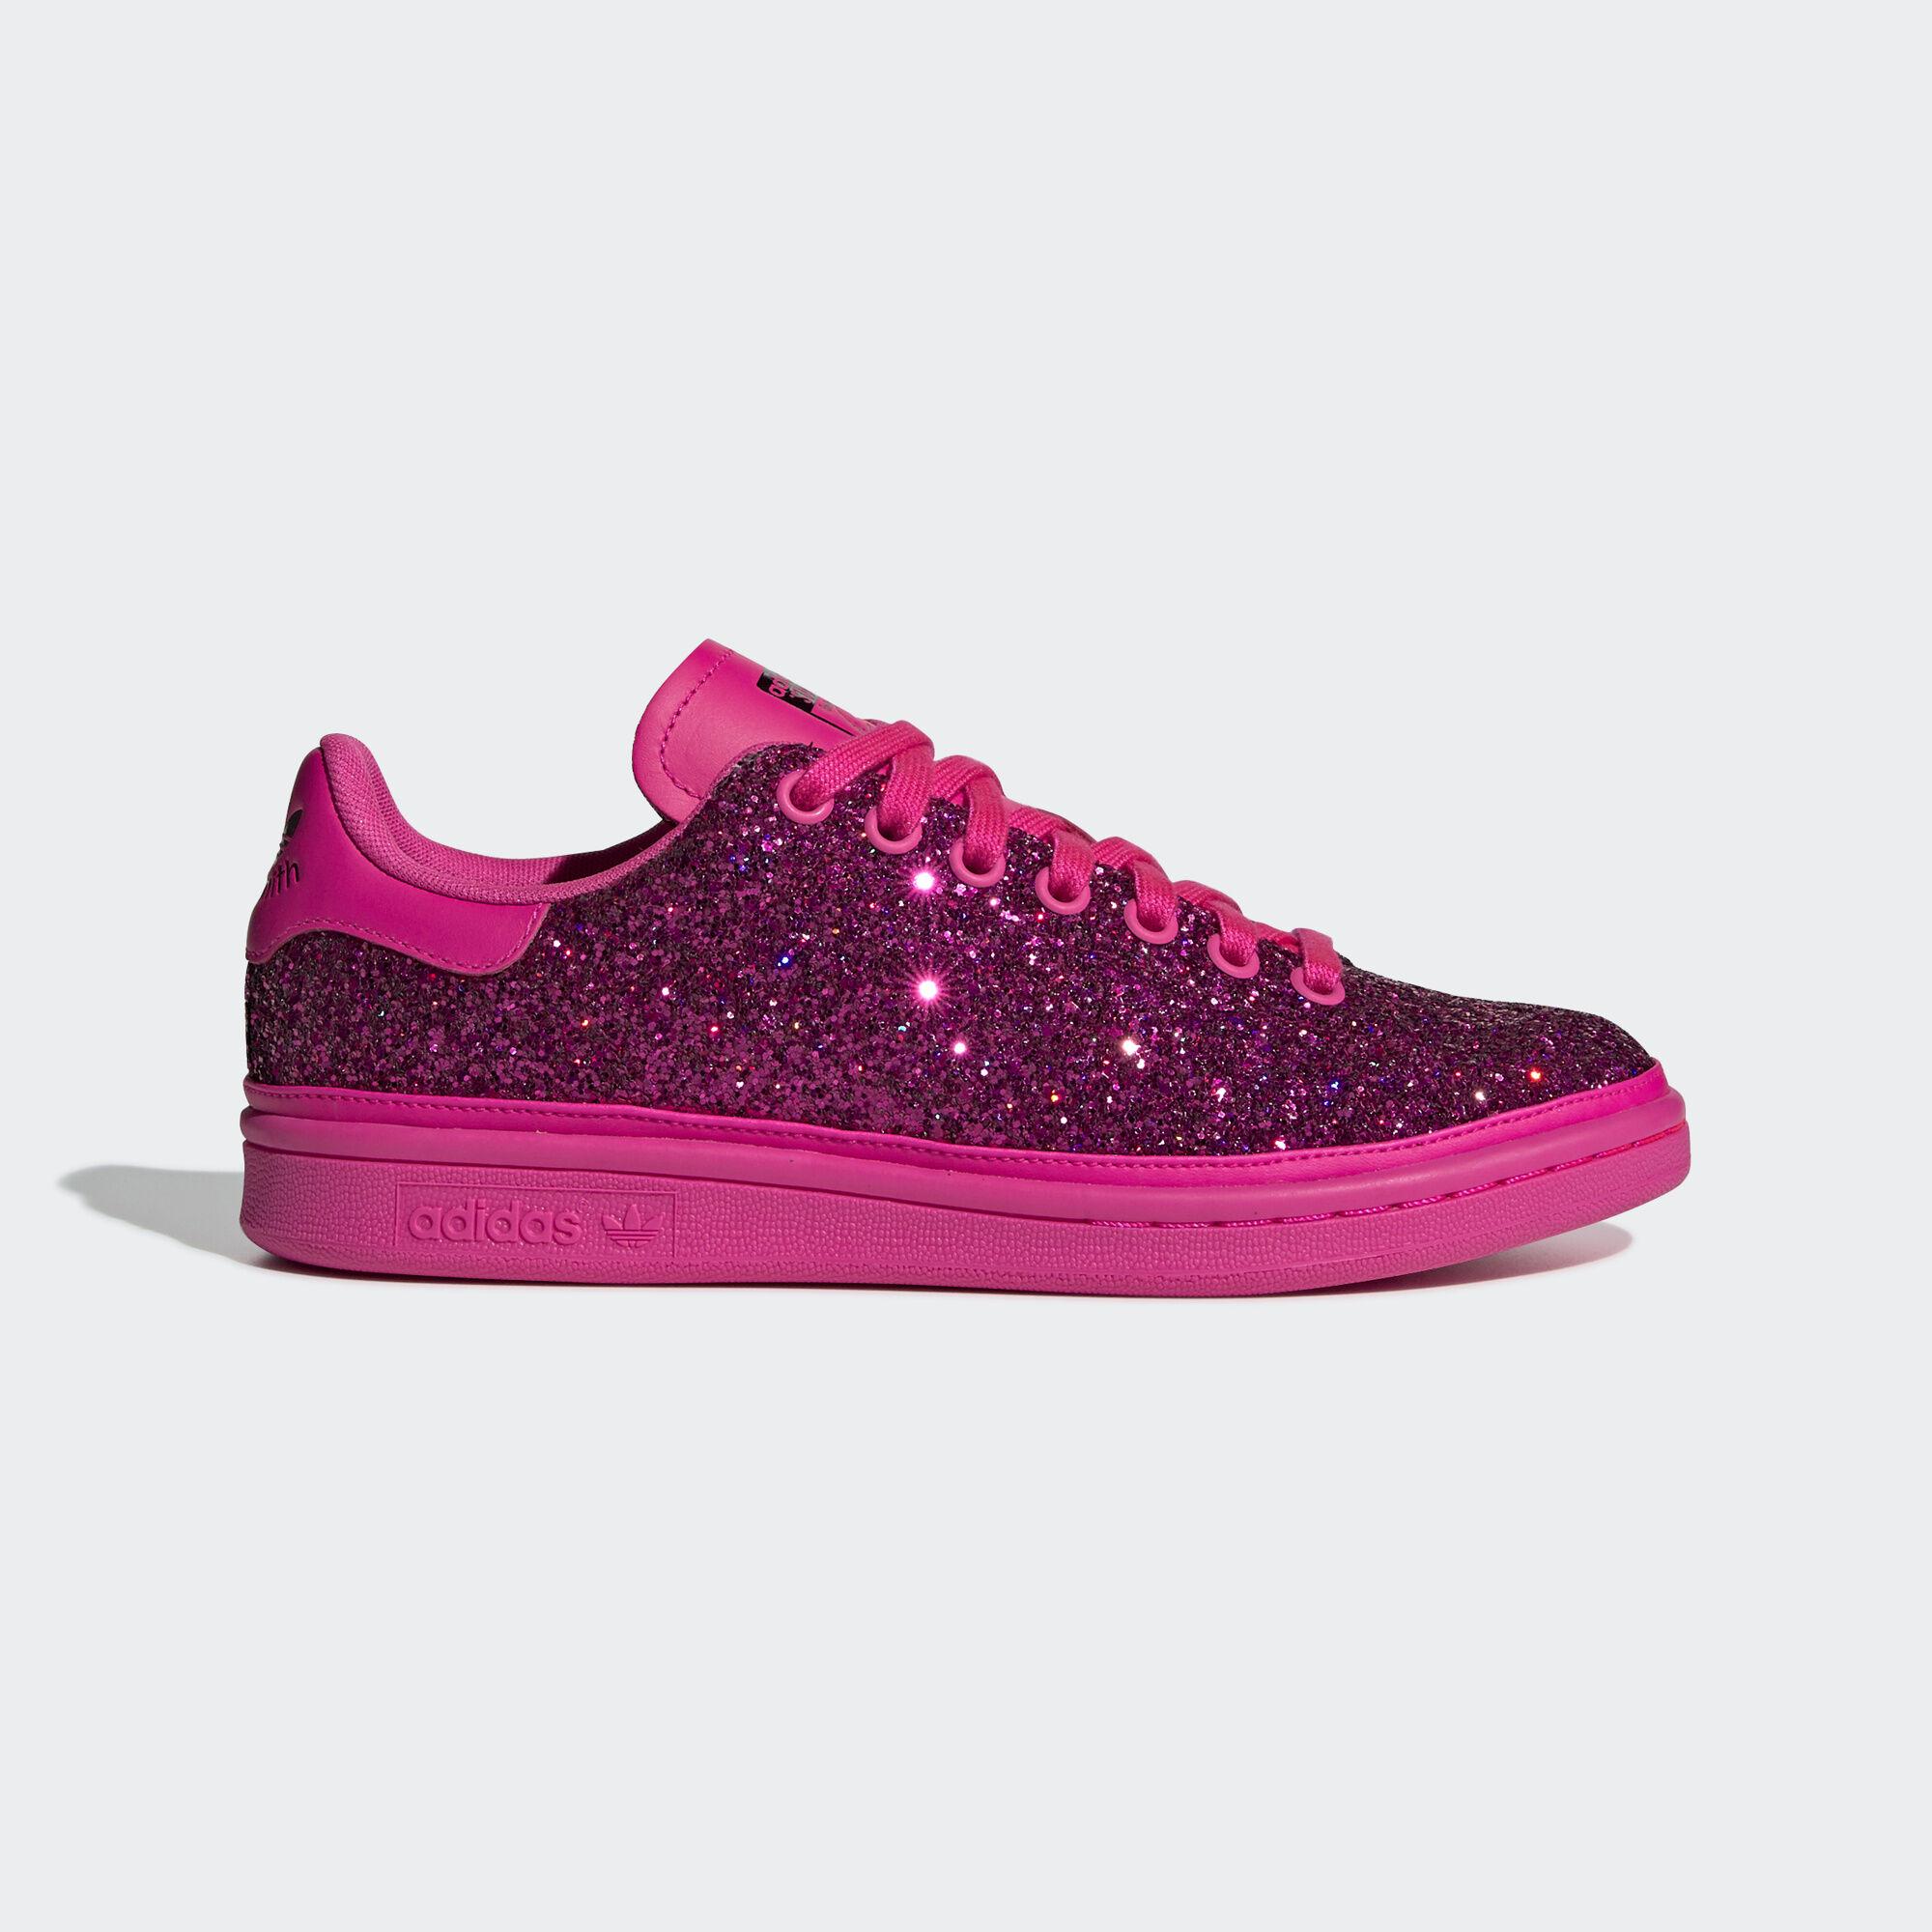 3c6e735611d3d ... pharrell williams hu holi stan smith in purple lyst ec35f 62ba6  cheap adidas  stan smith shoes shock pink shock pink collegiate purple bd8058 74655 ...